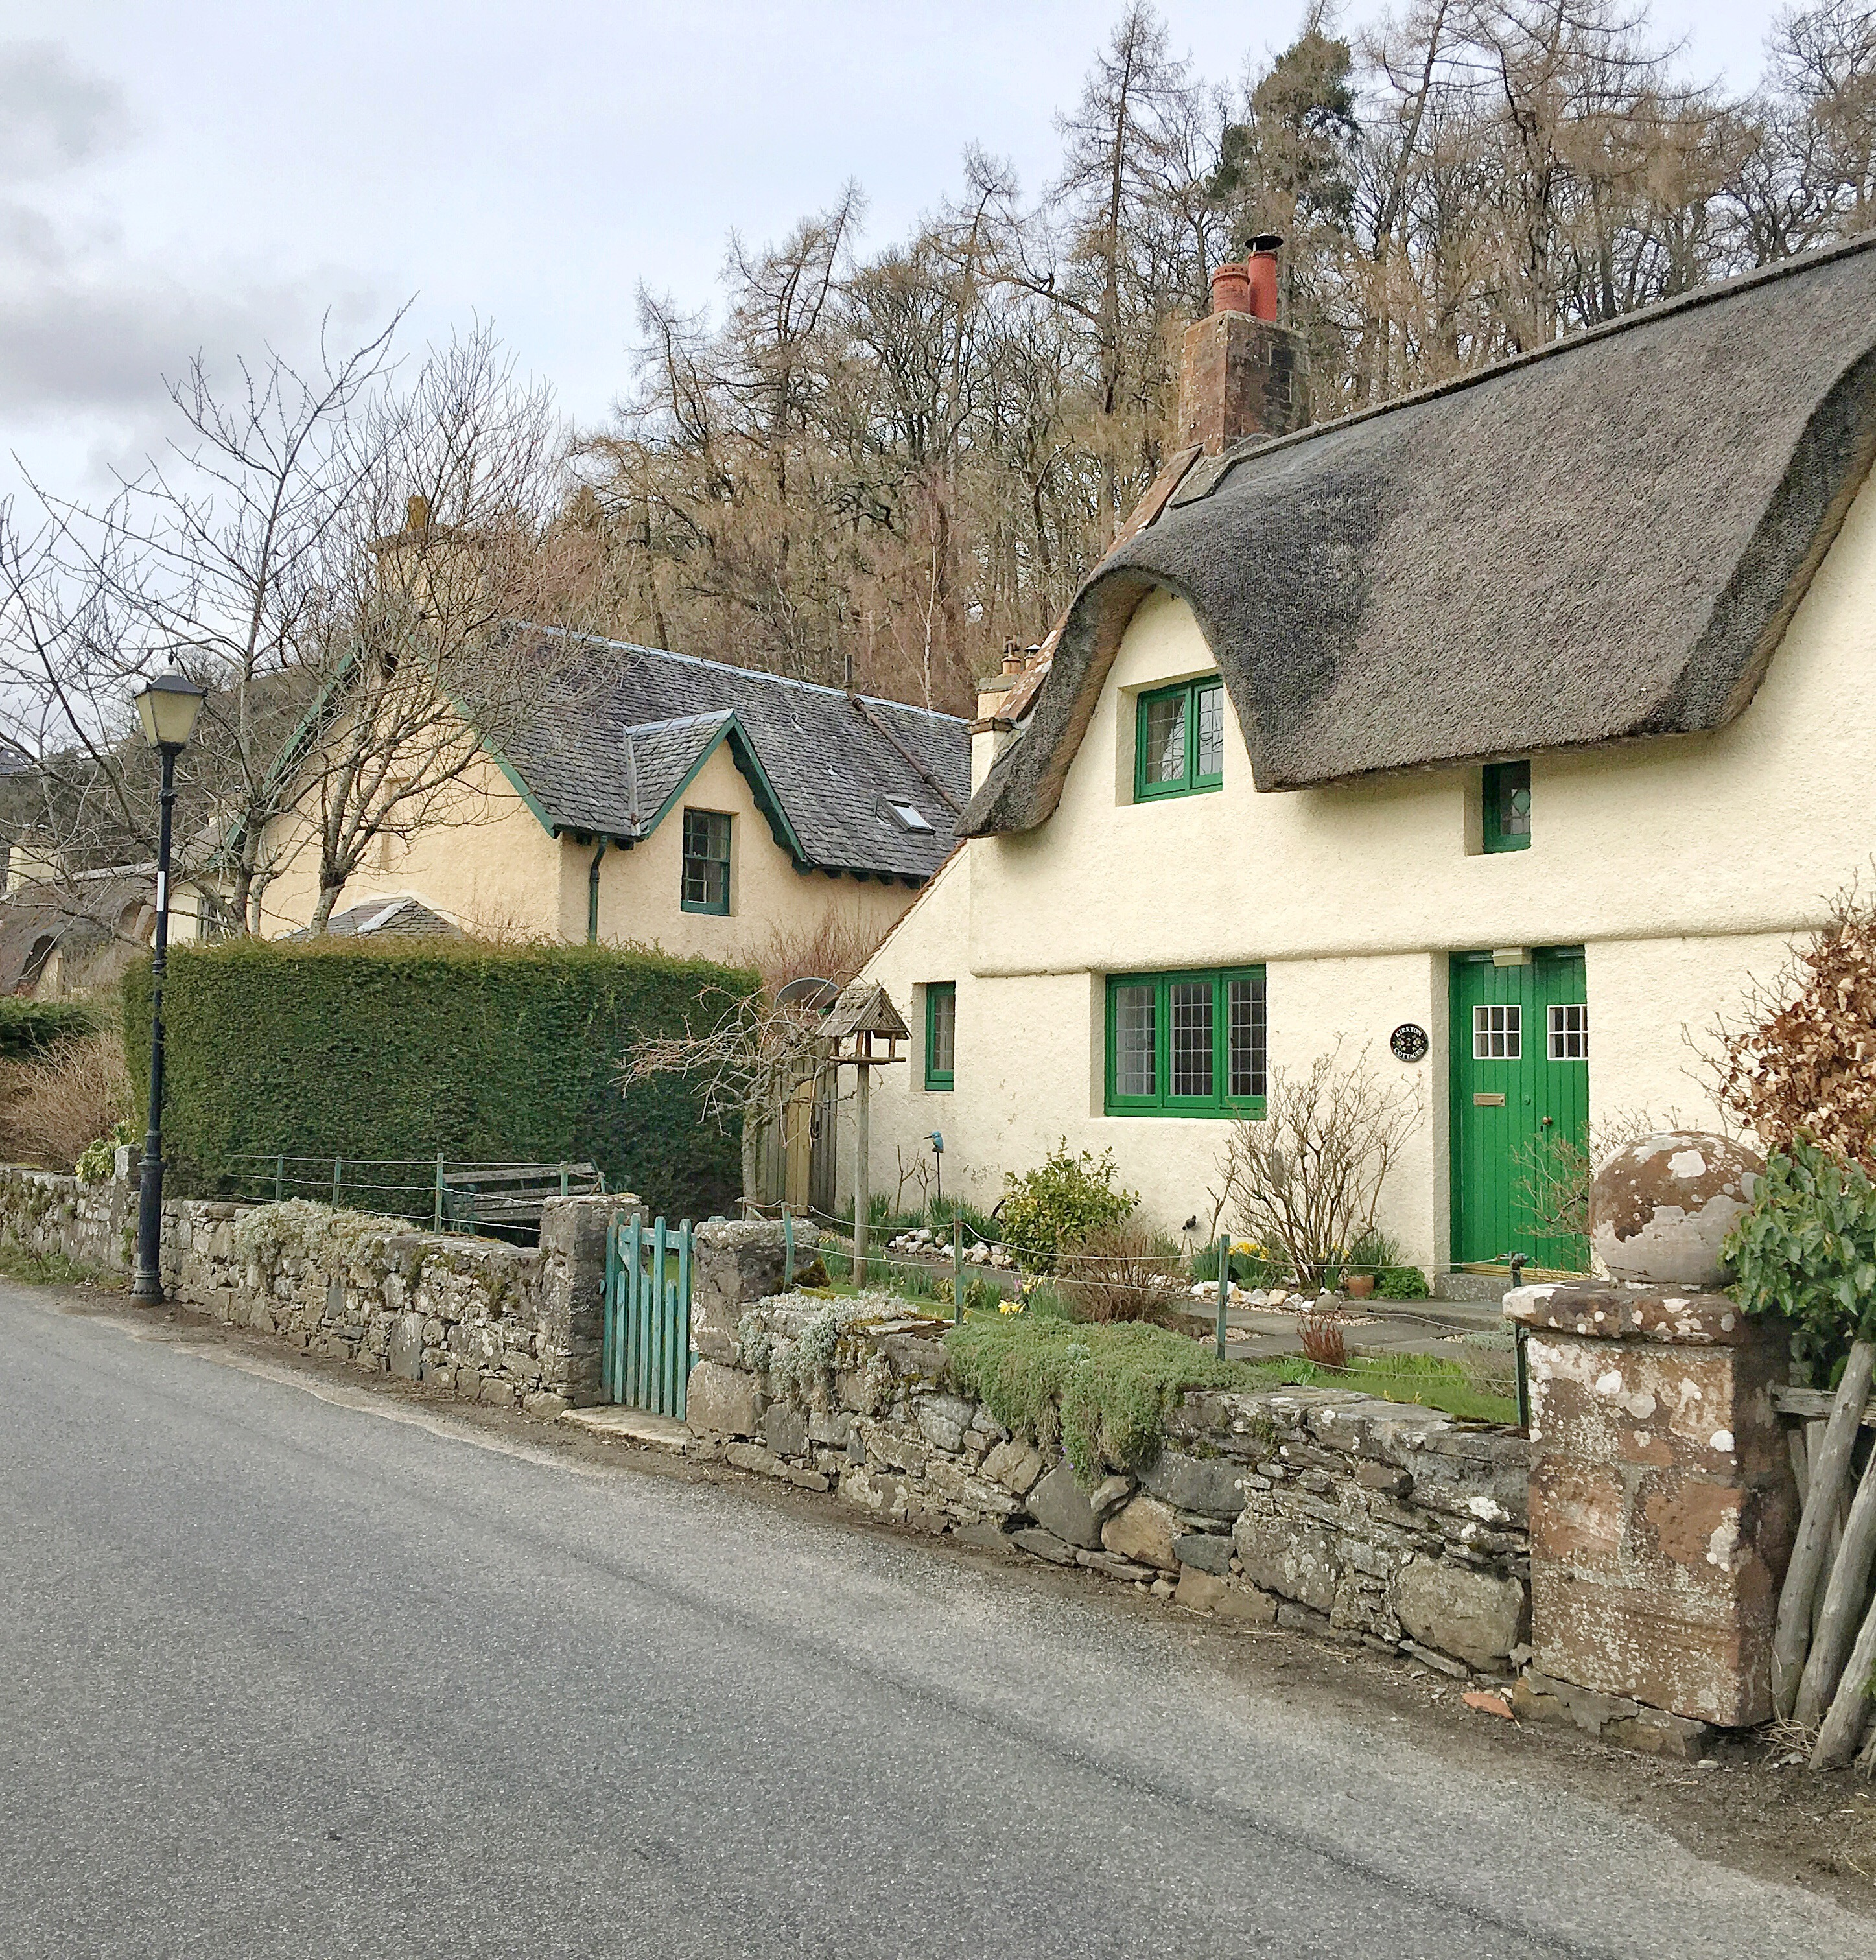 A Short Break In The Pretty Perthshire Village Of